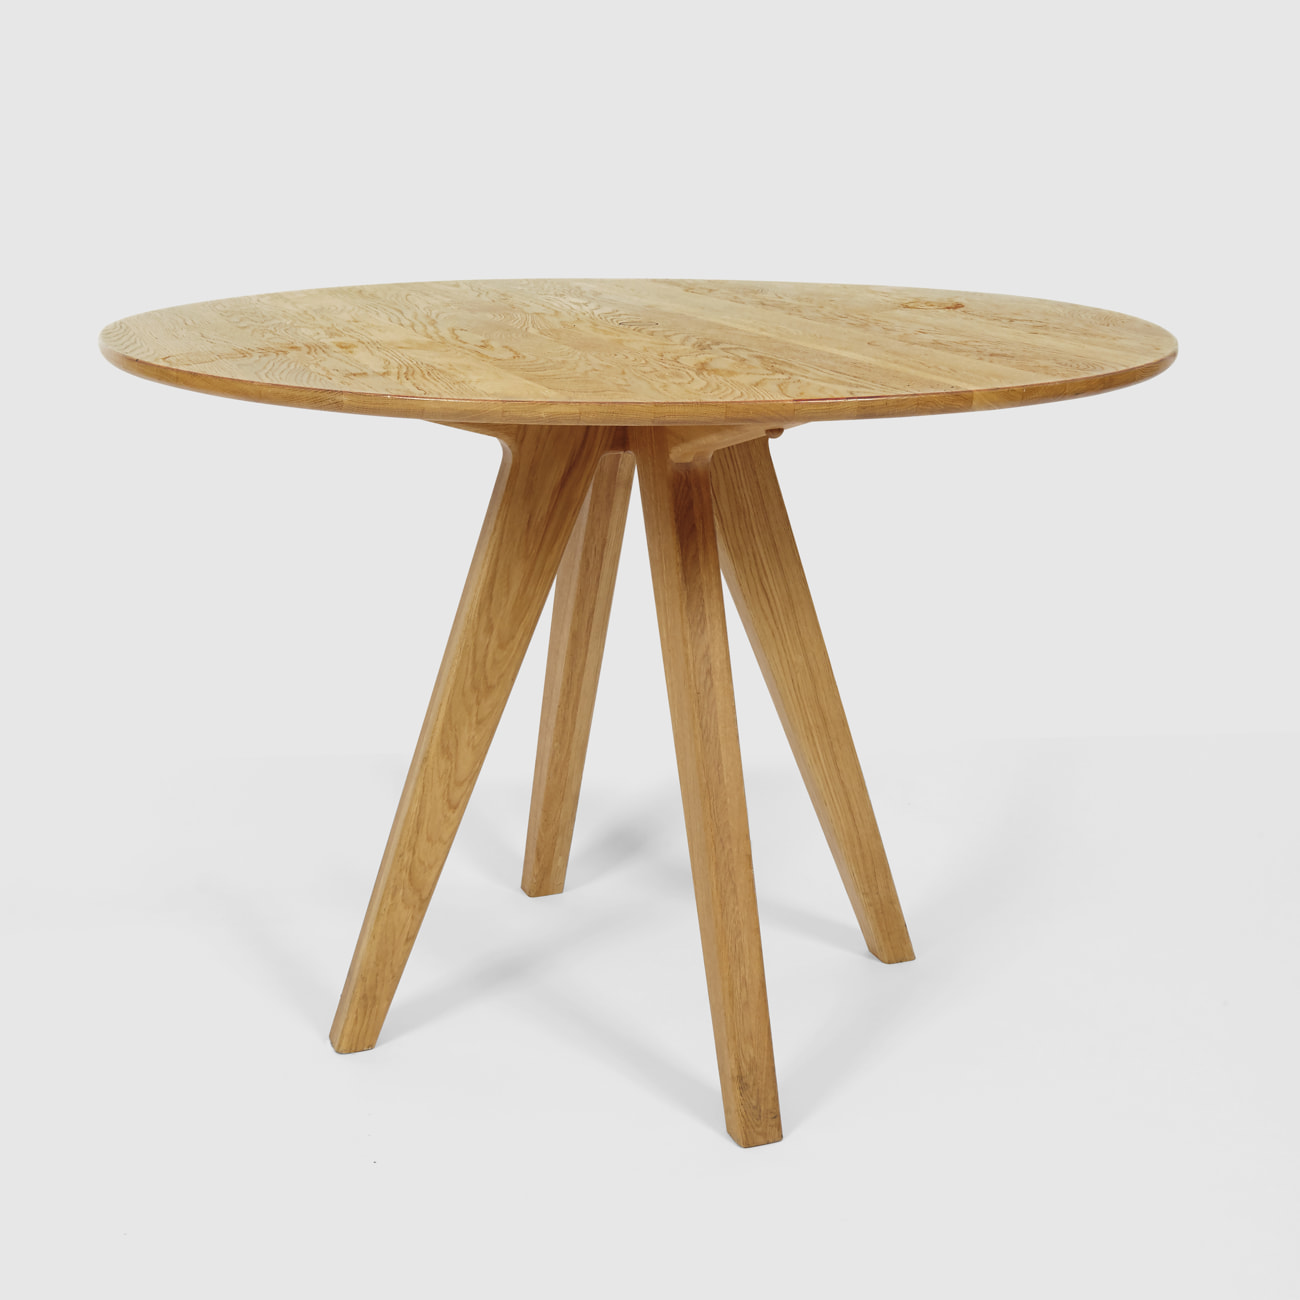 furniture-remix-arthur-table-oak-the-hansen-family-1